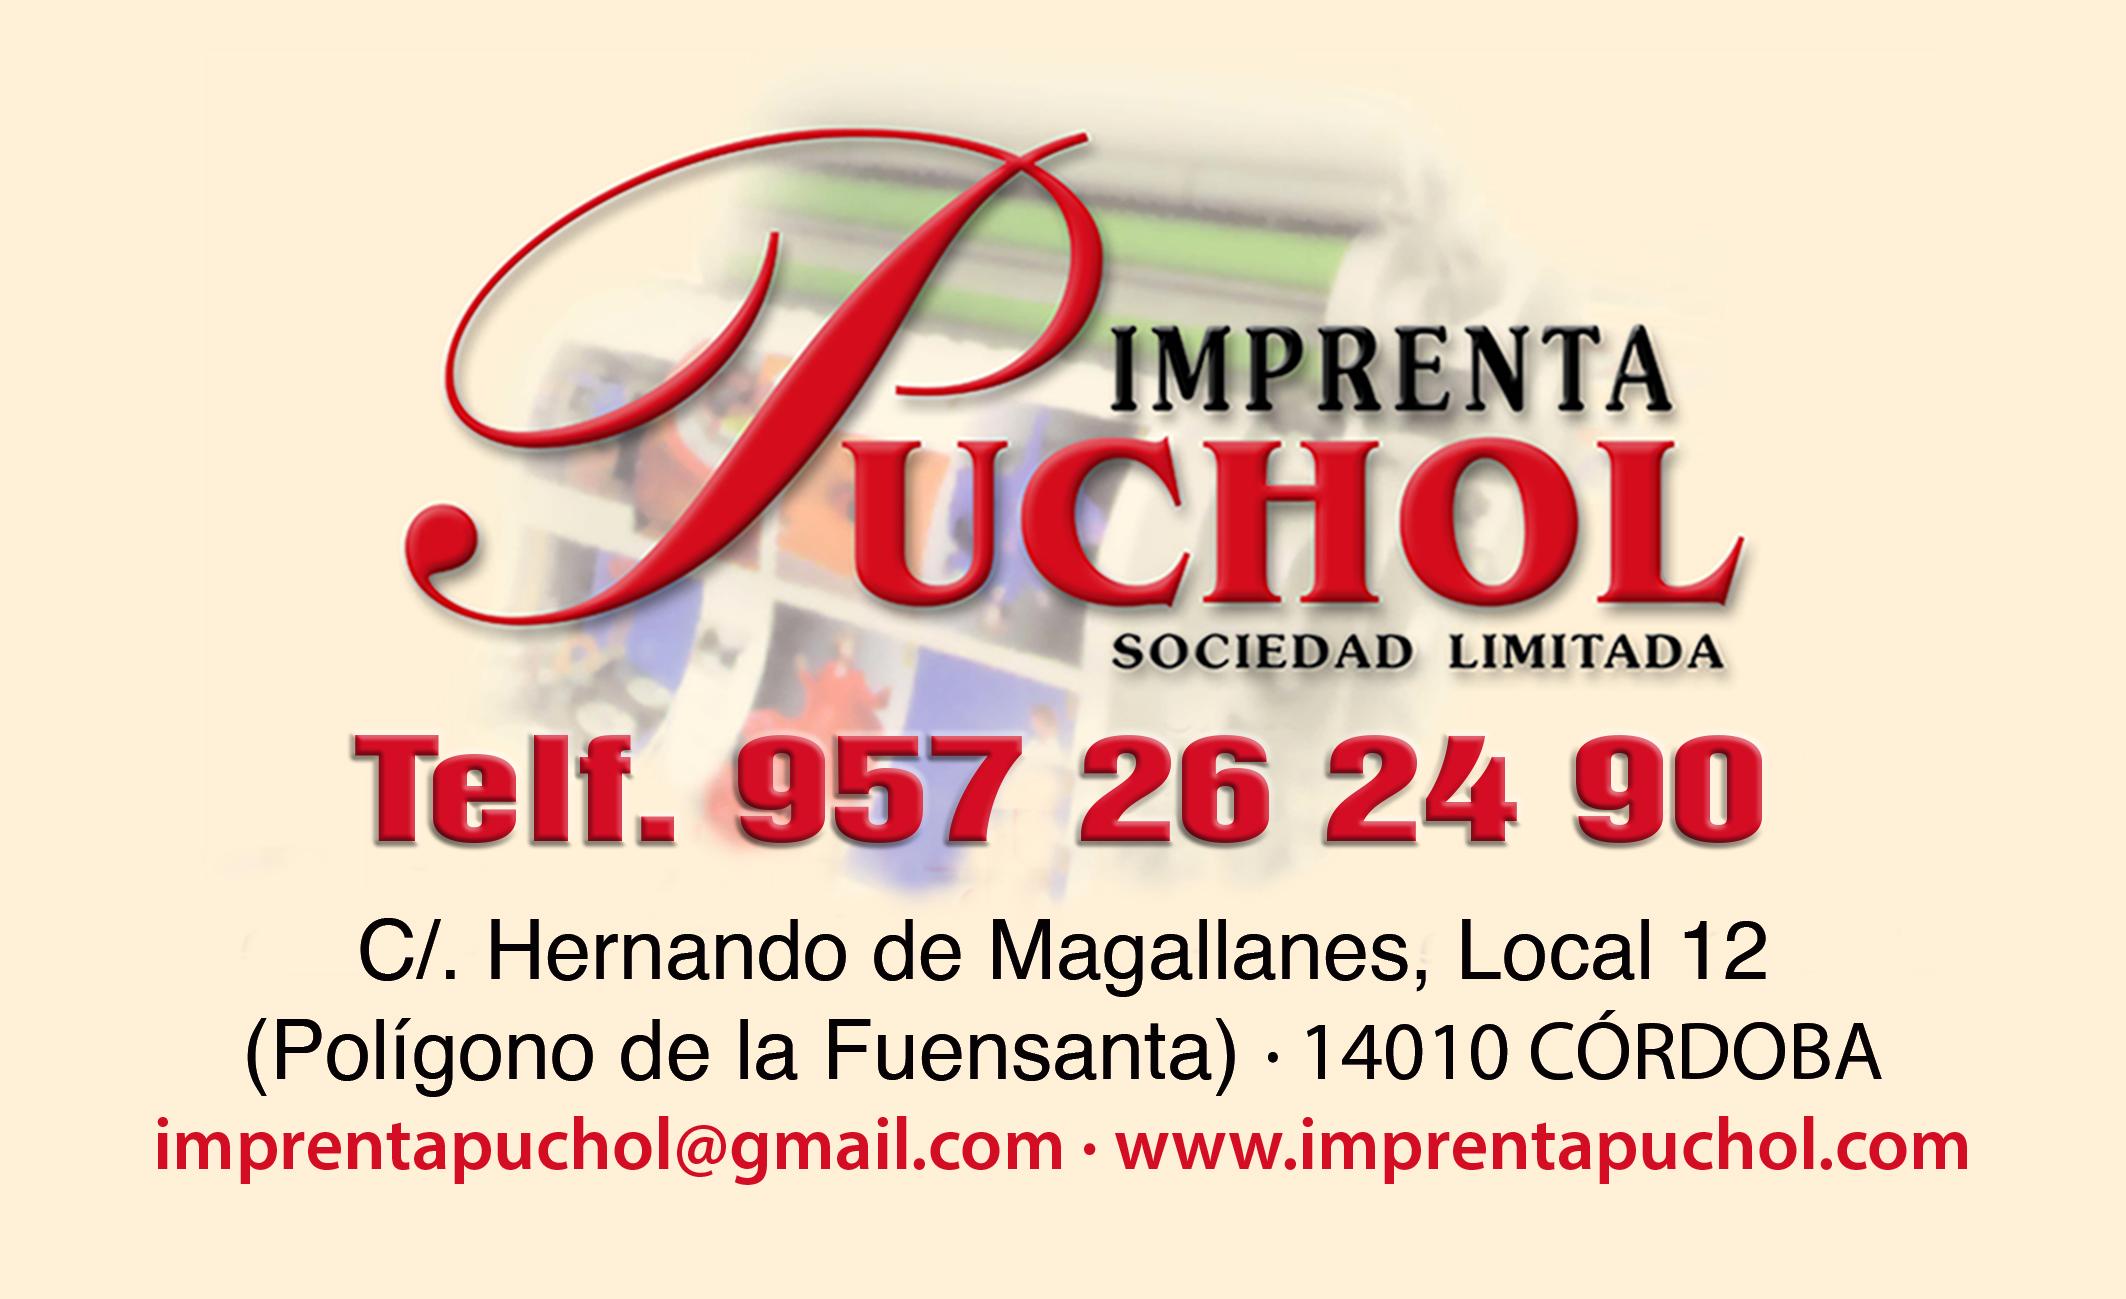 Imprenta Puchol S.l.